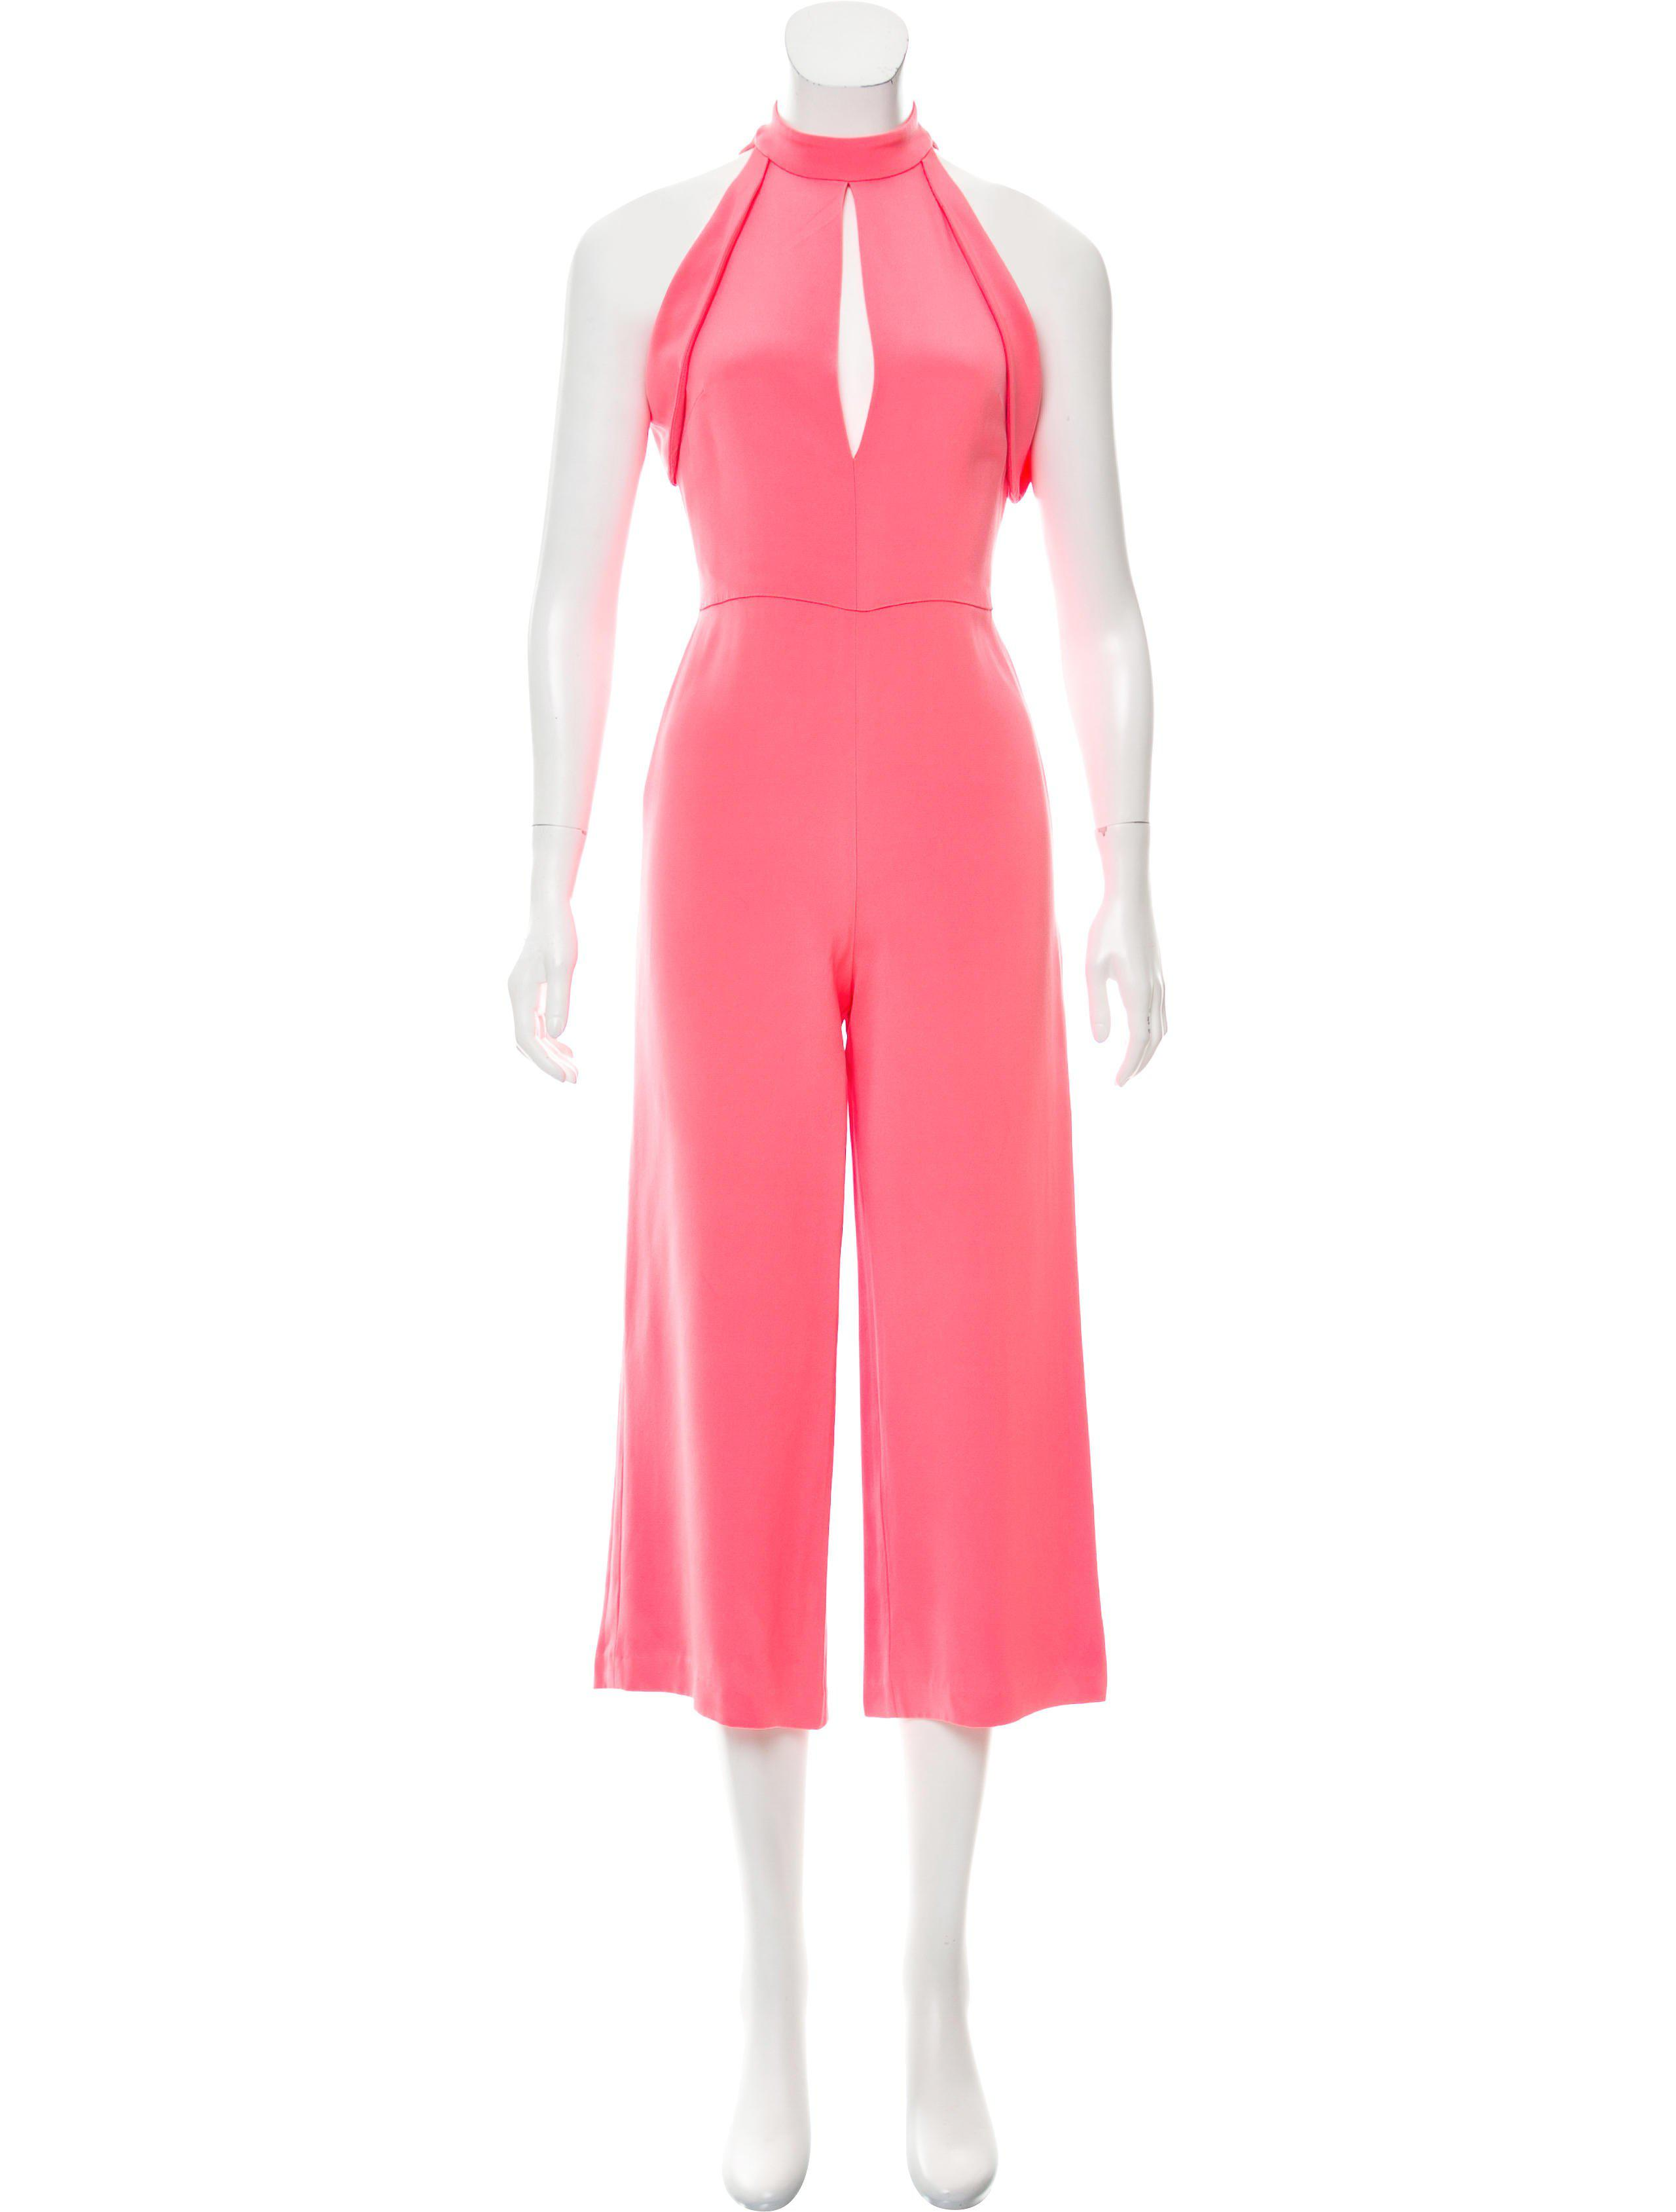 8c82986af662 Lyst - Cushnie Et Ochs Sleeveless Wide-leg Jumpsuit Neon in Yellow